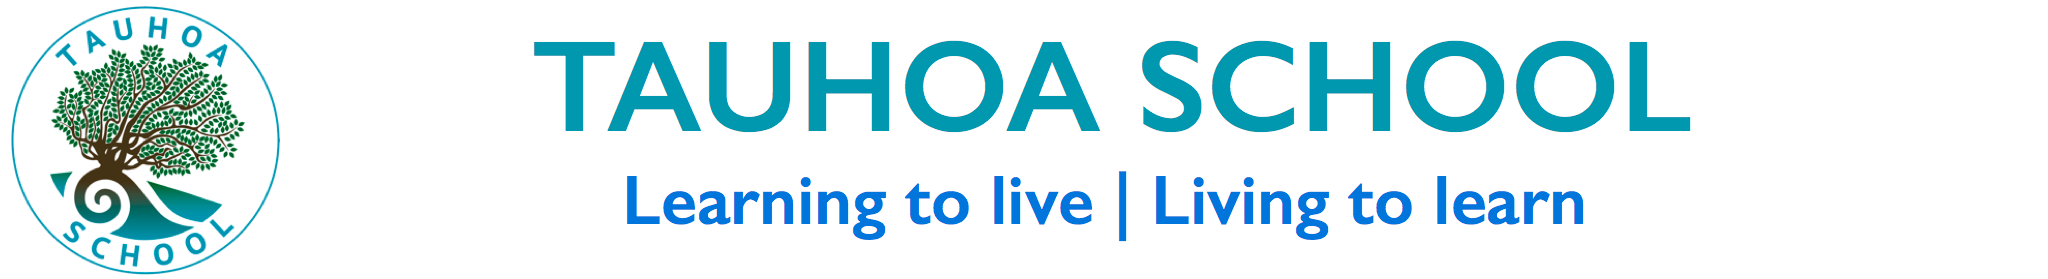 Tauhoa School Logo